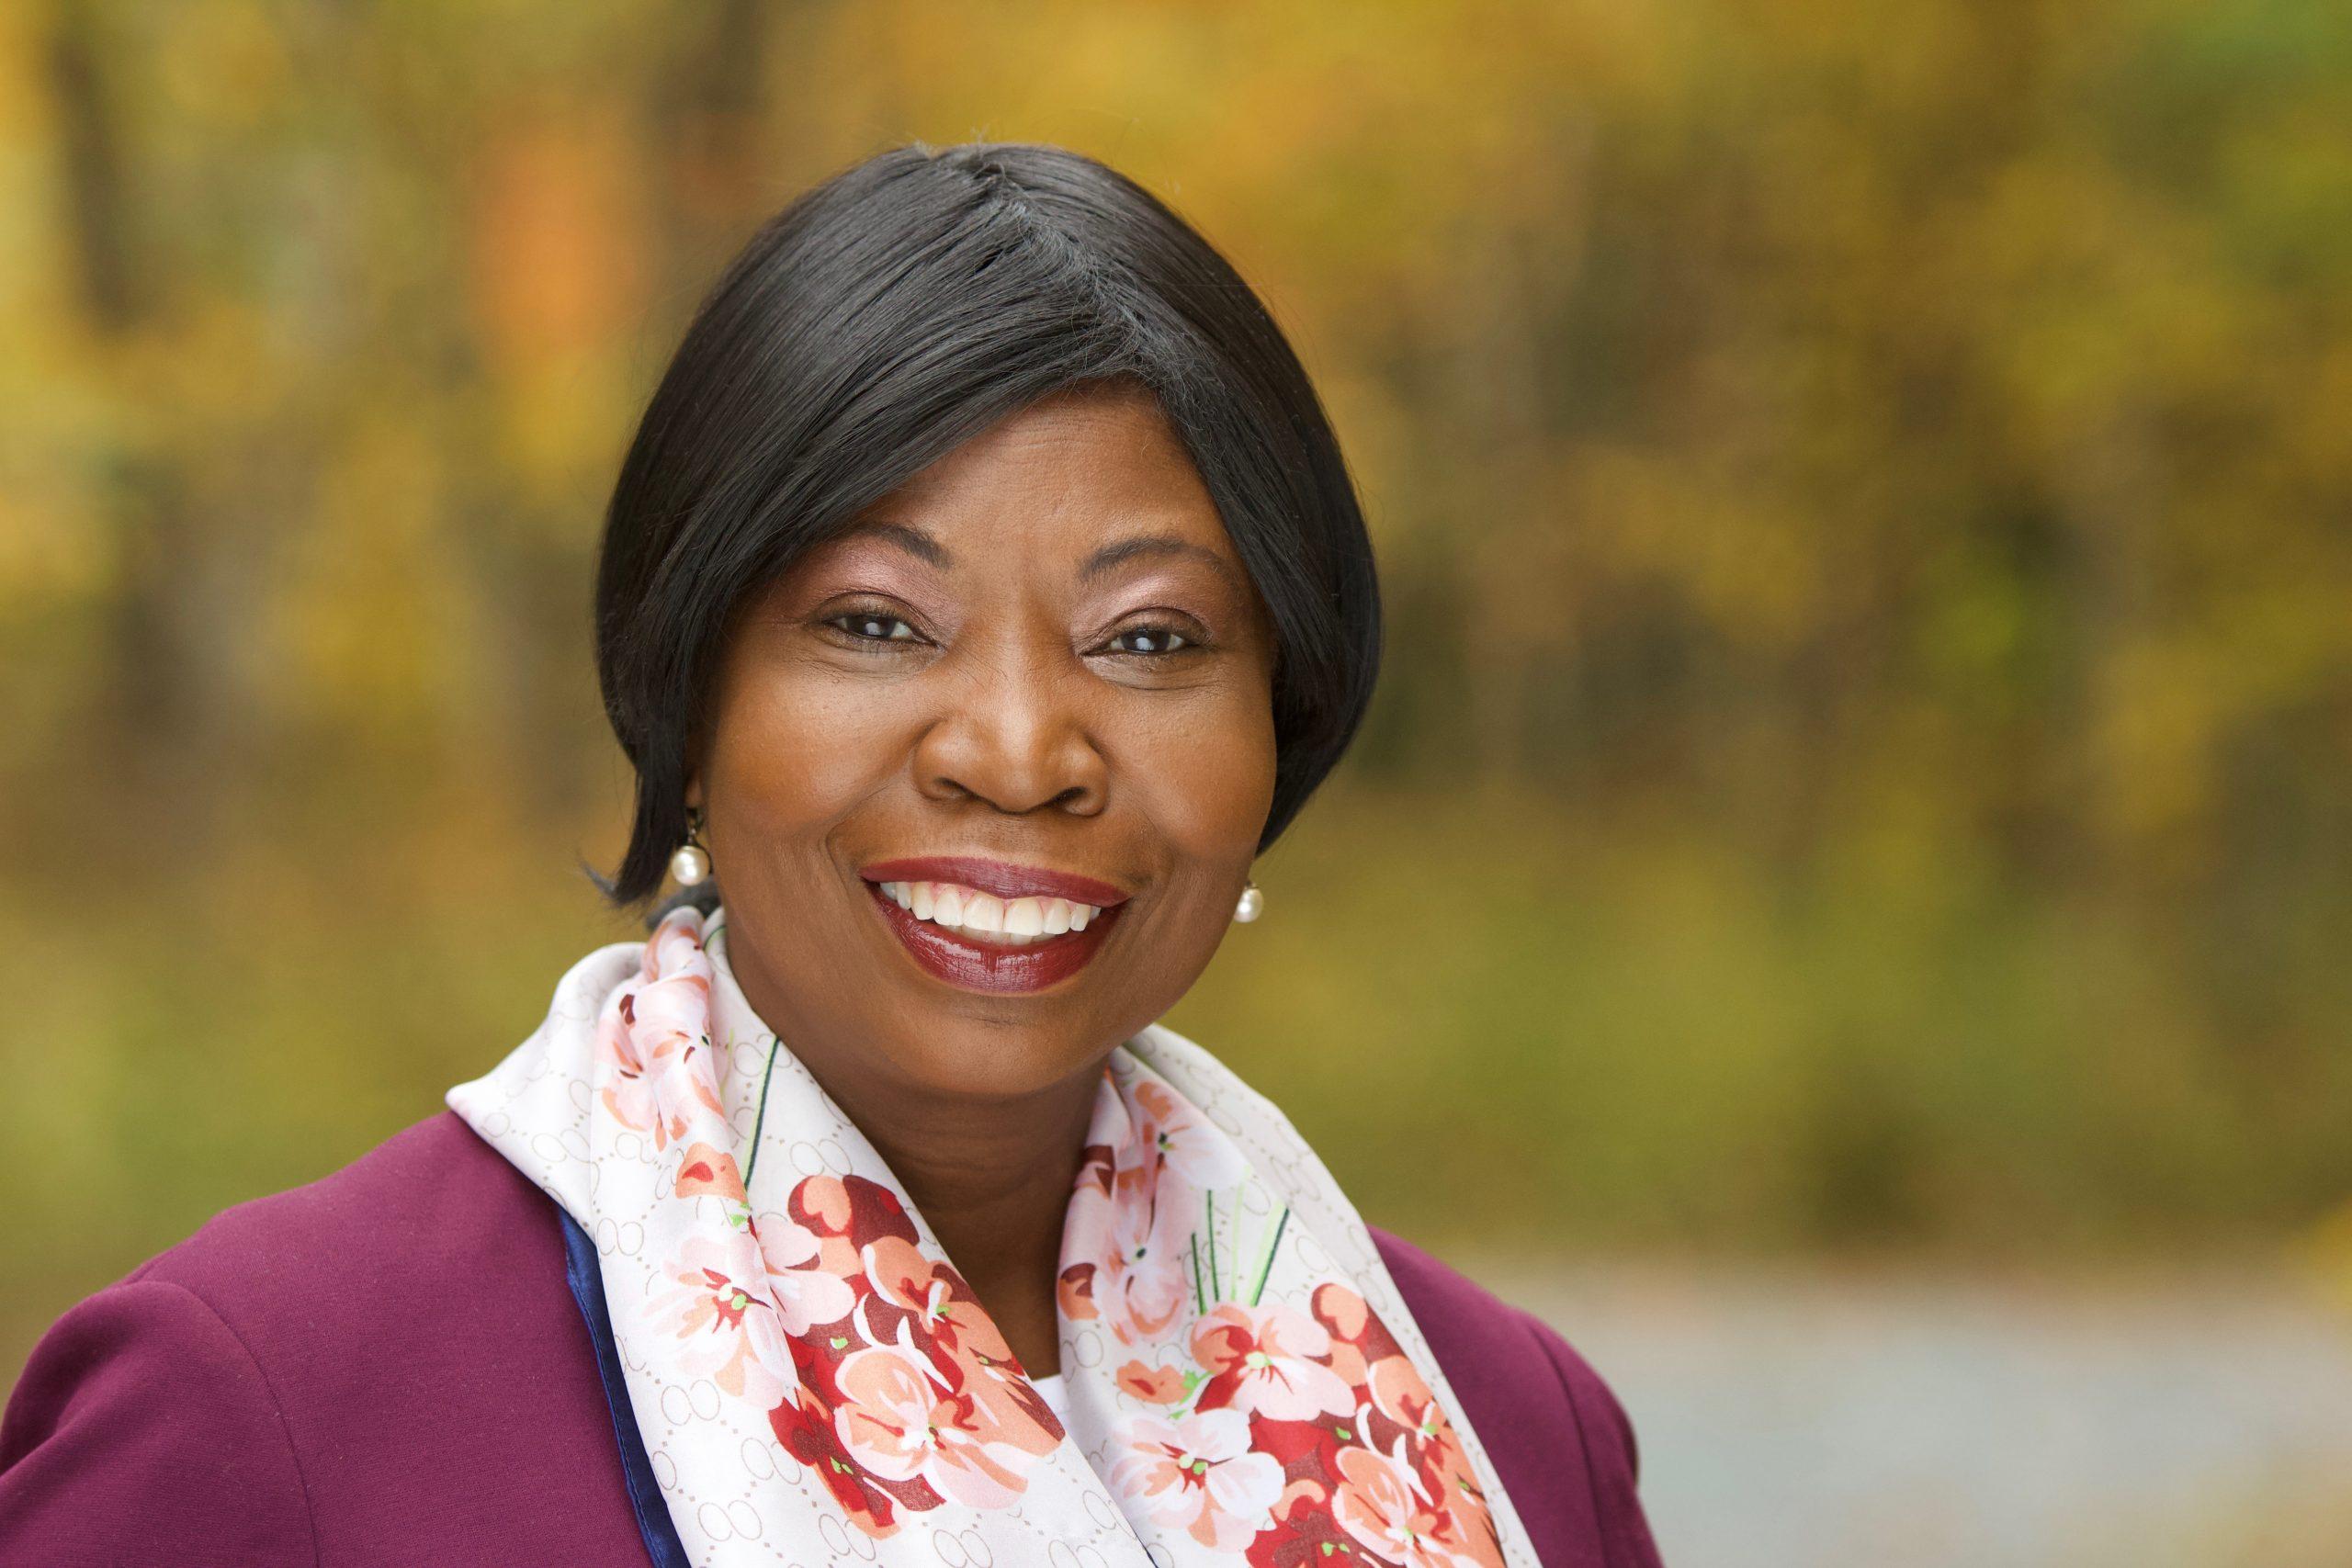 Amplifying Voices: Ann Divine